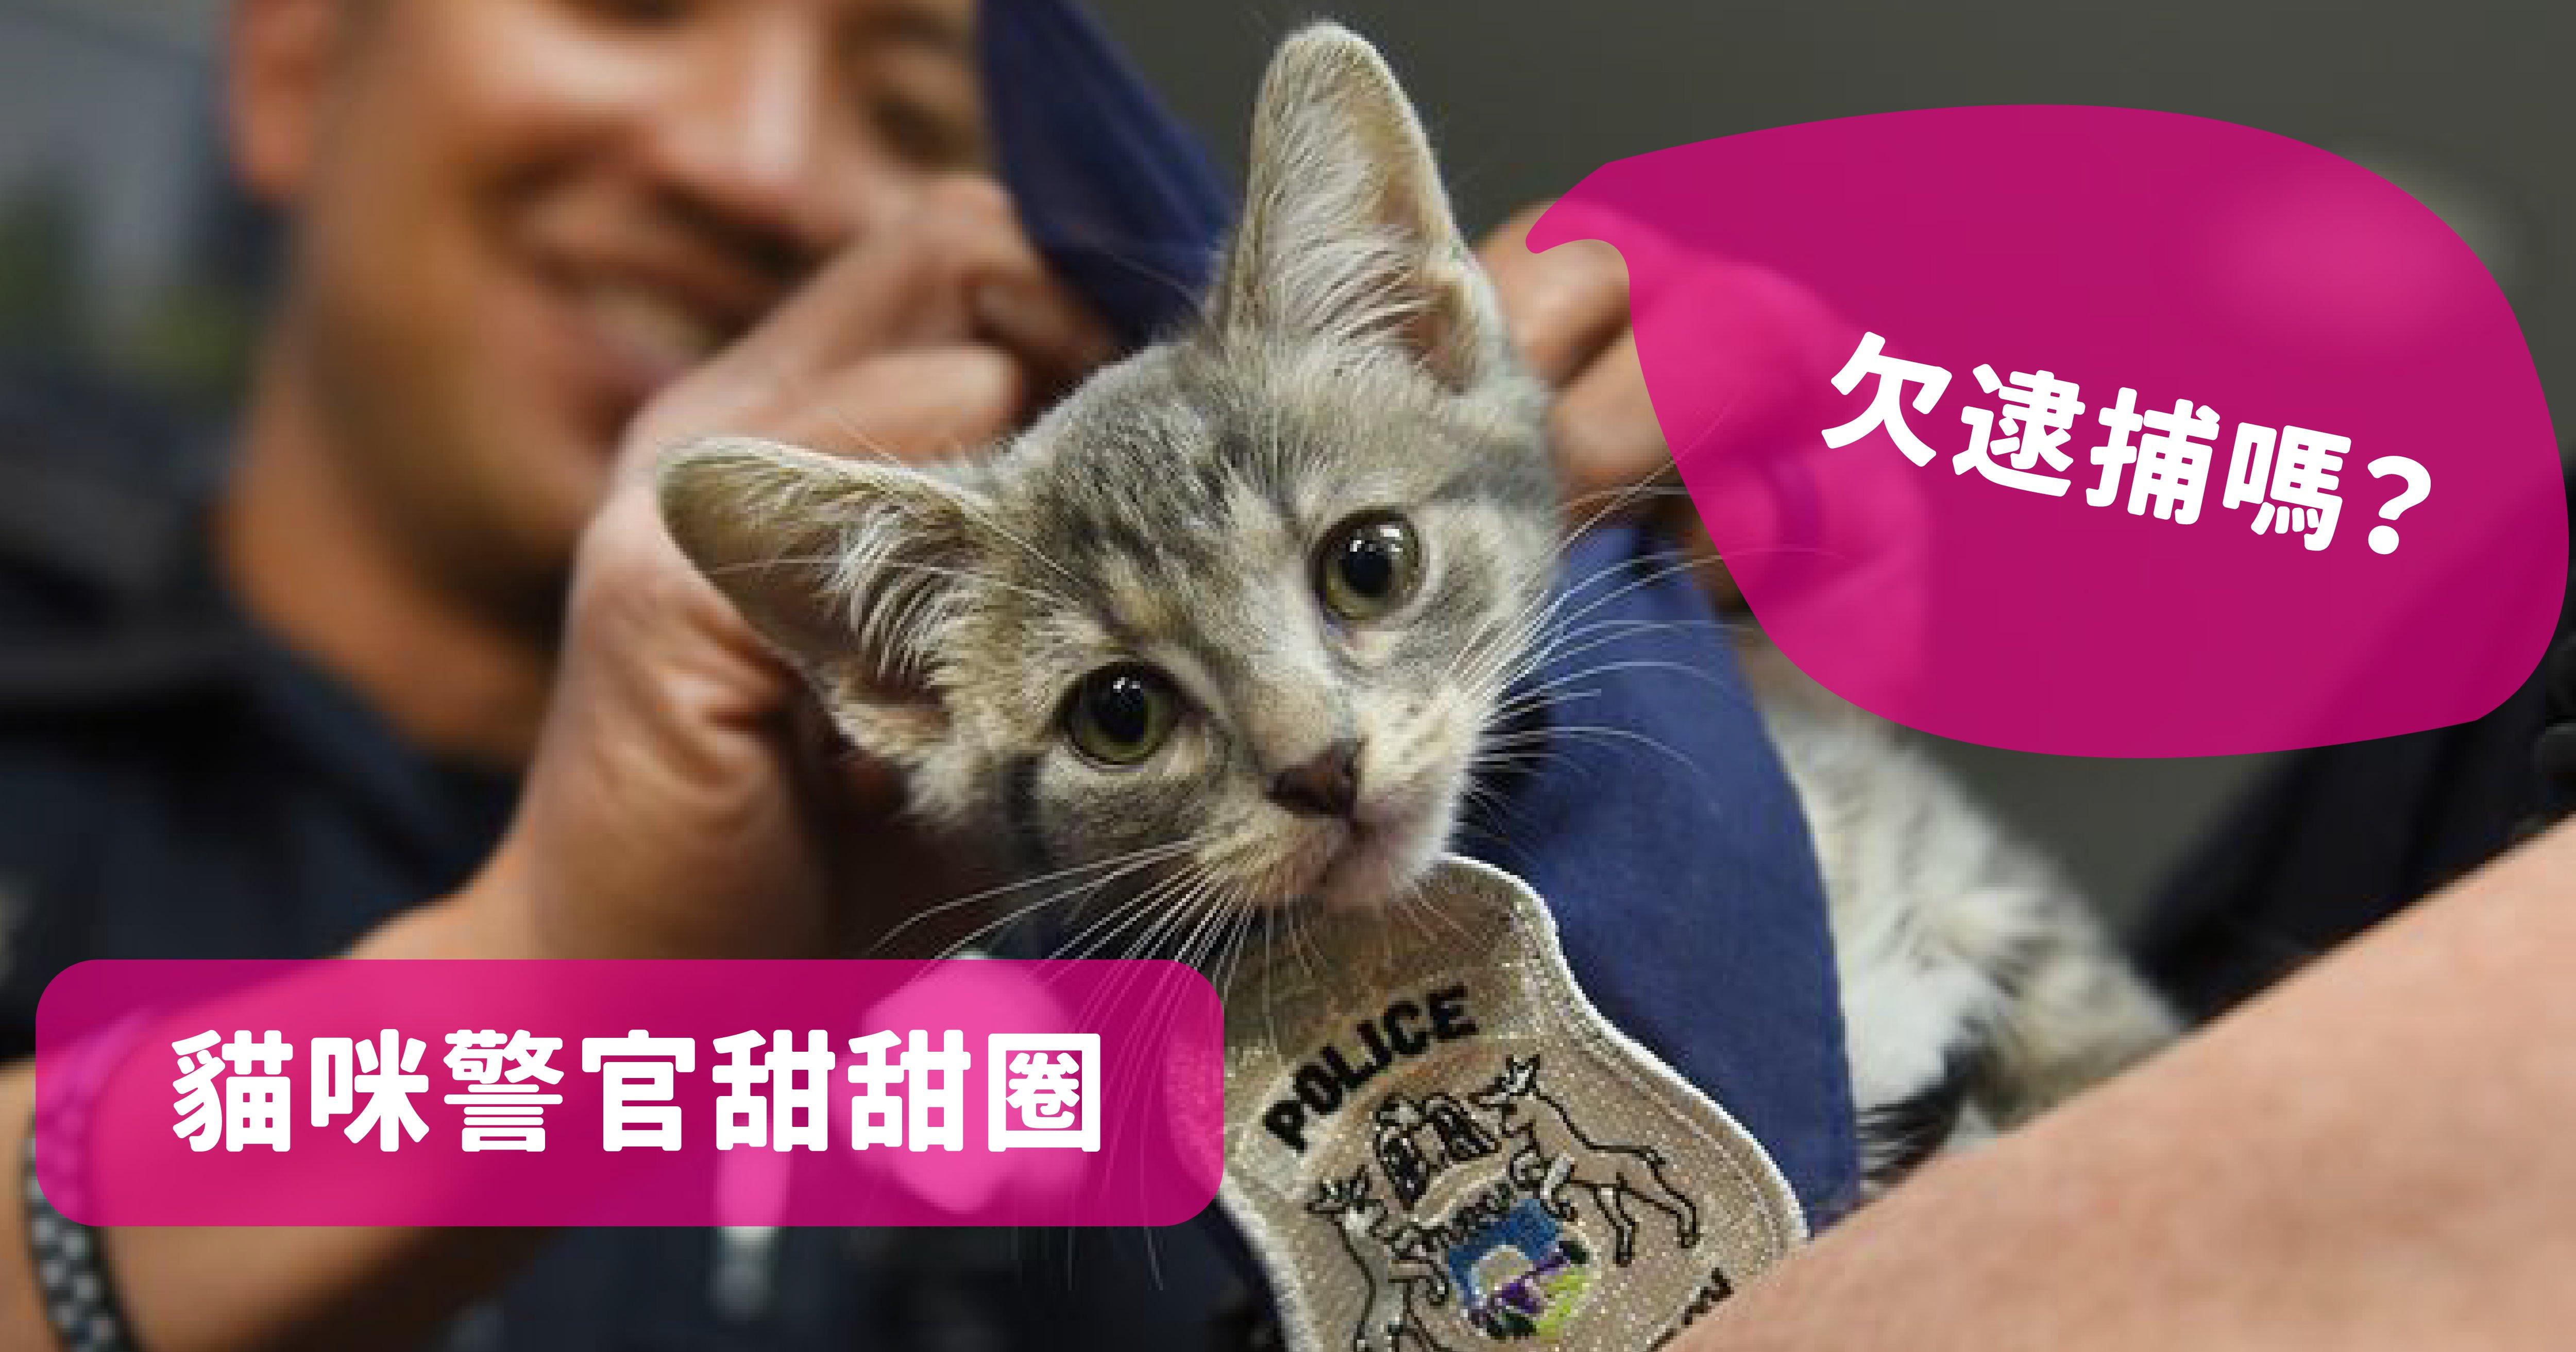 vonvone5b081e99da2 e8b293 01.png?resize=1200,630 - 美國警局為了衝人氣雇用超萌「警貓」,警察們都融化成貓奴啦~